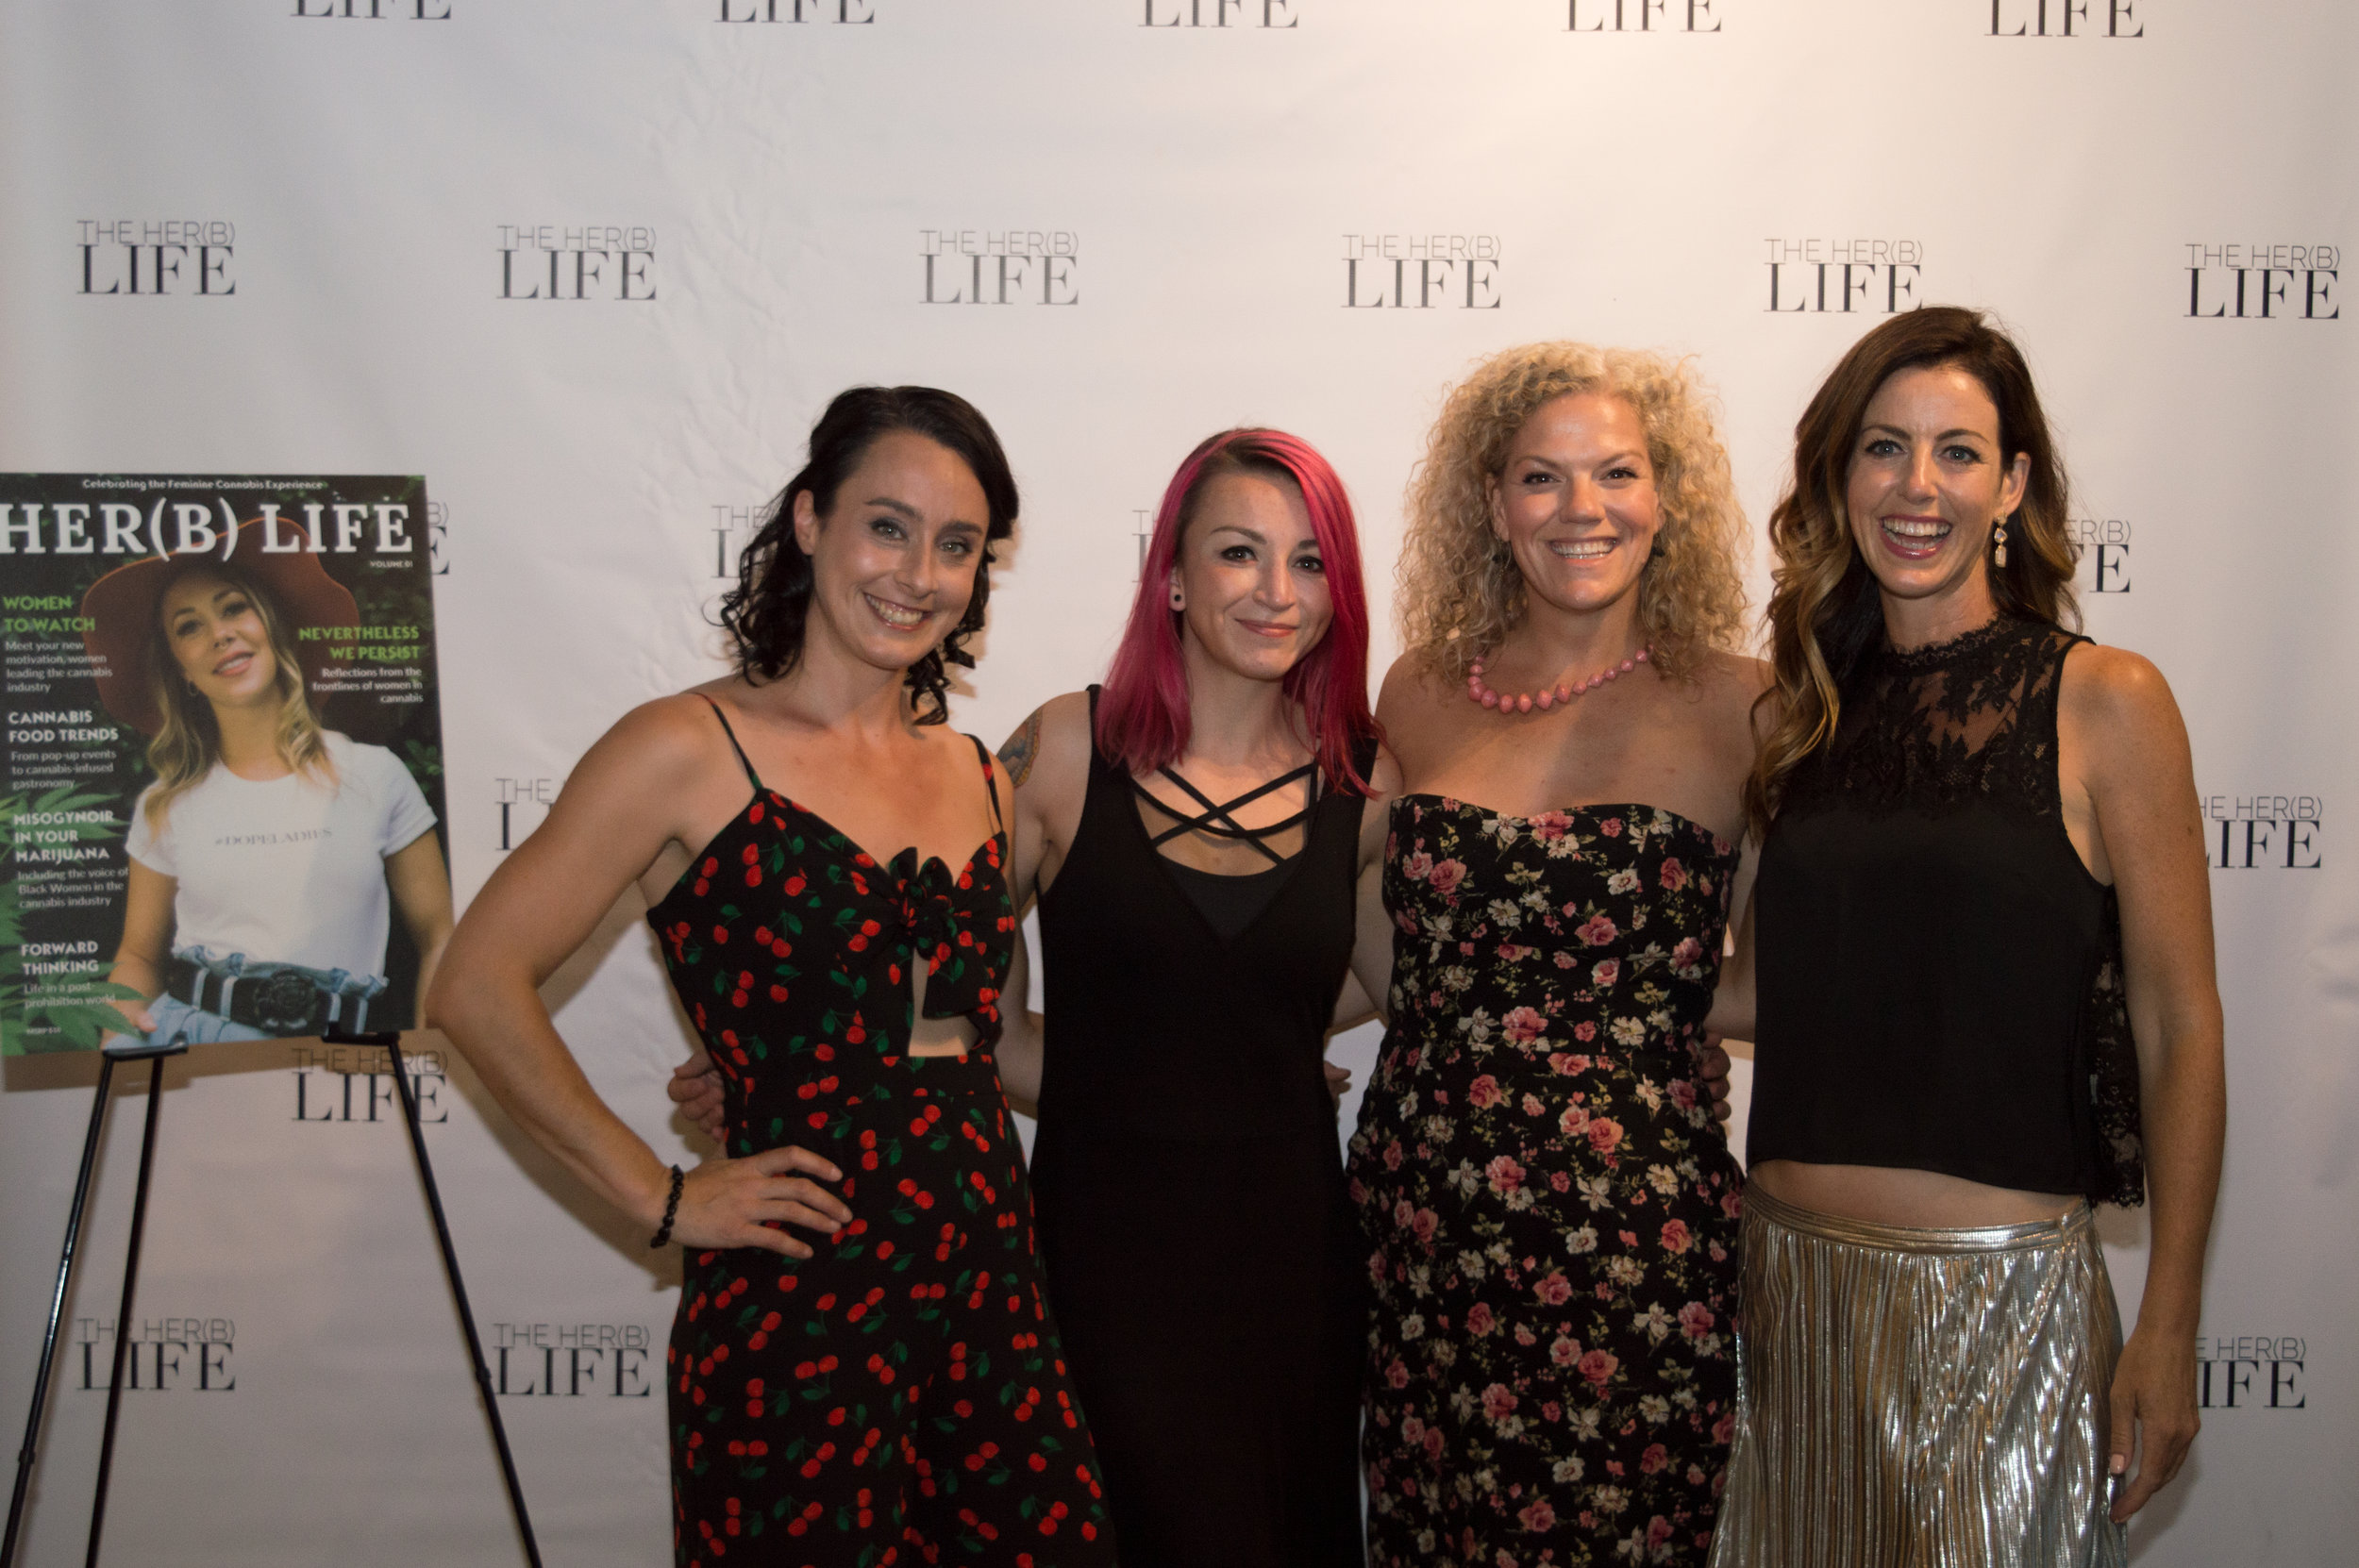 MaryBeth Lafferty, Amanda Siebert, Siobhan McCarthy and Unity Marguerite